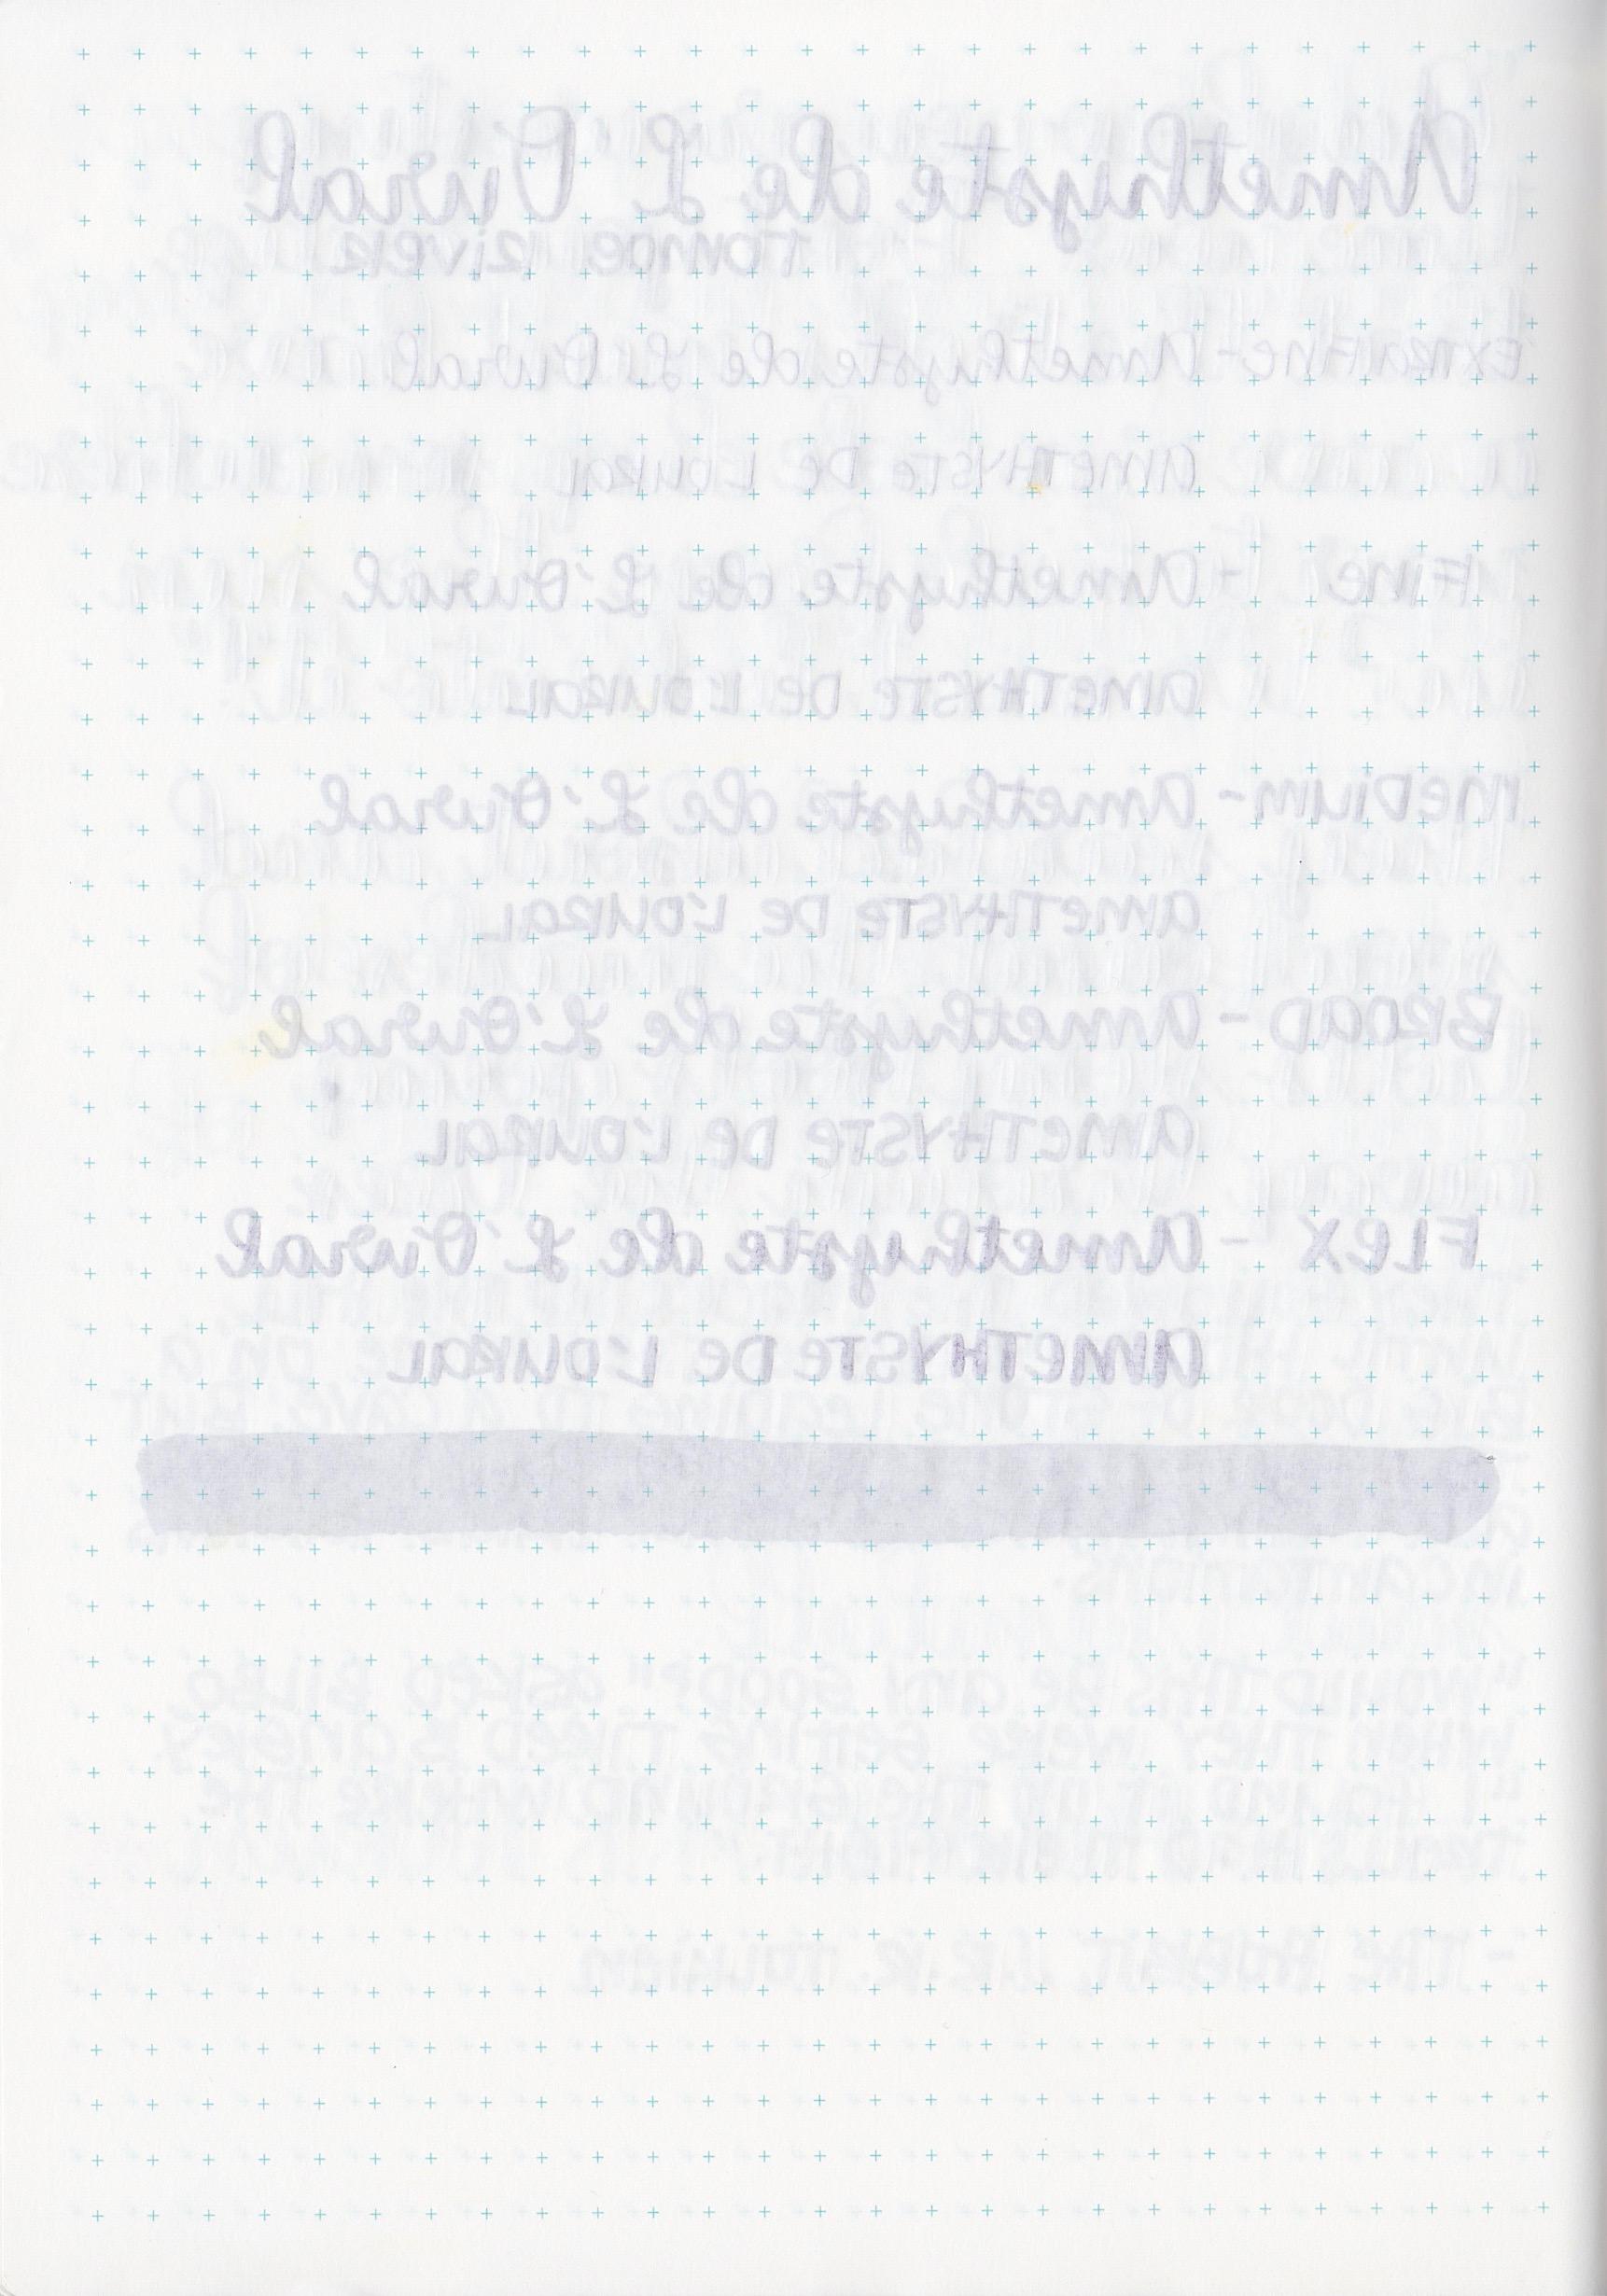 JH1789AmethysteDeLOural - 8.jpg